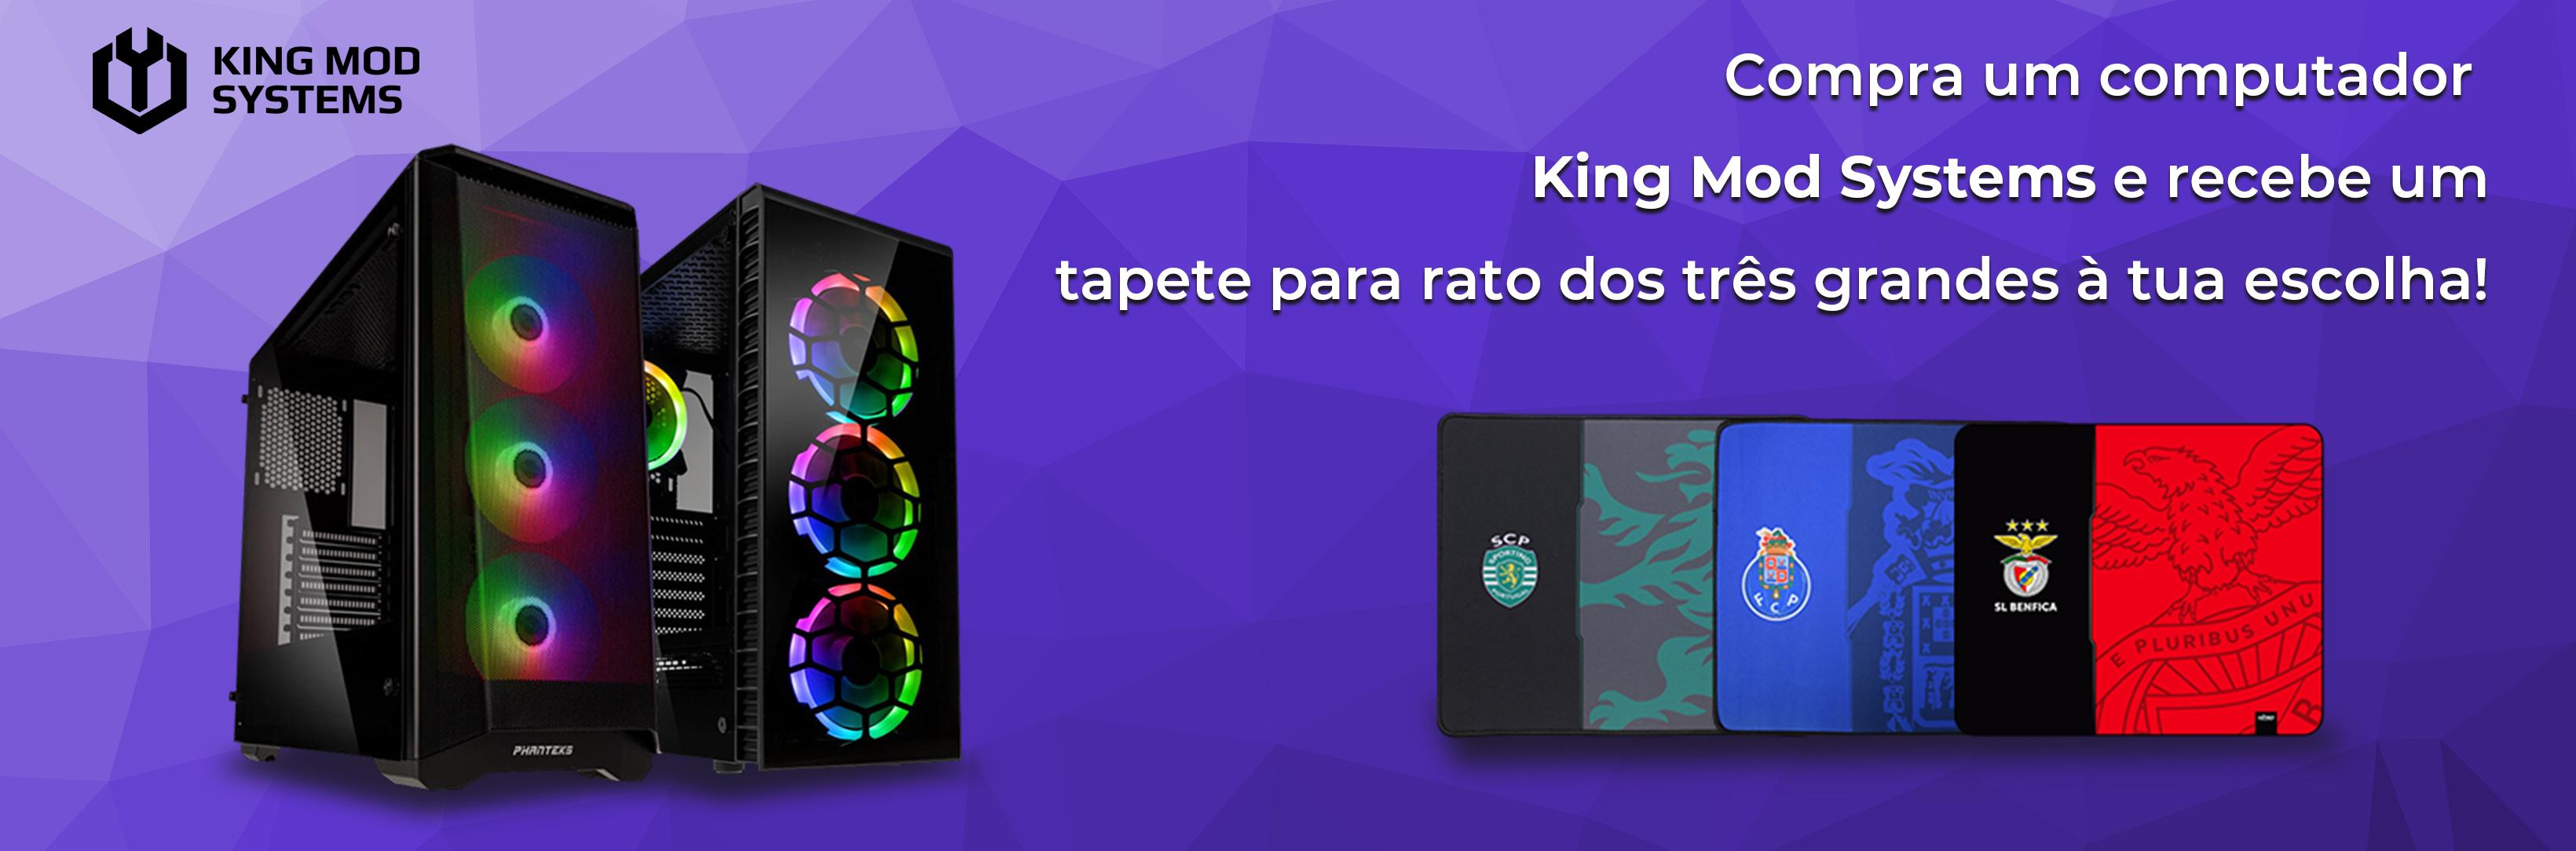 King Mod - Oferta Tapete